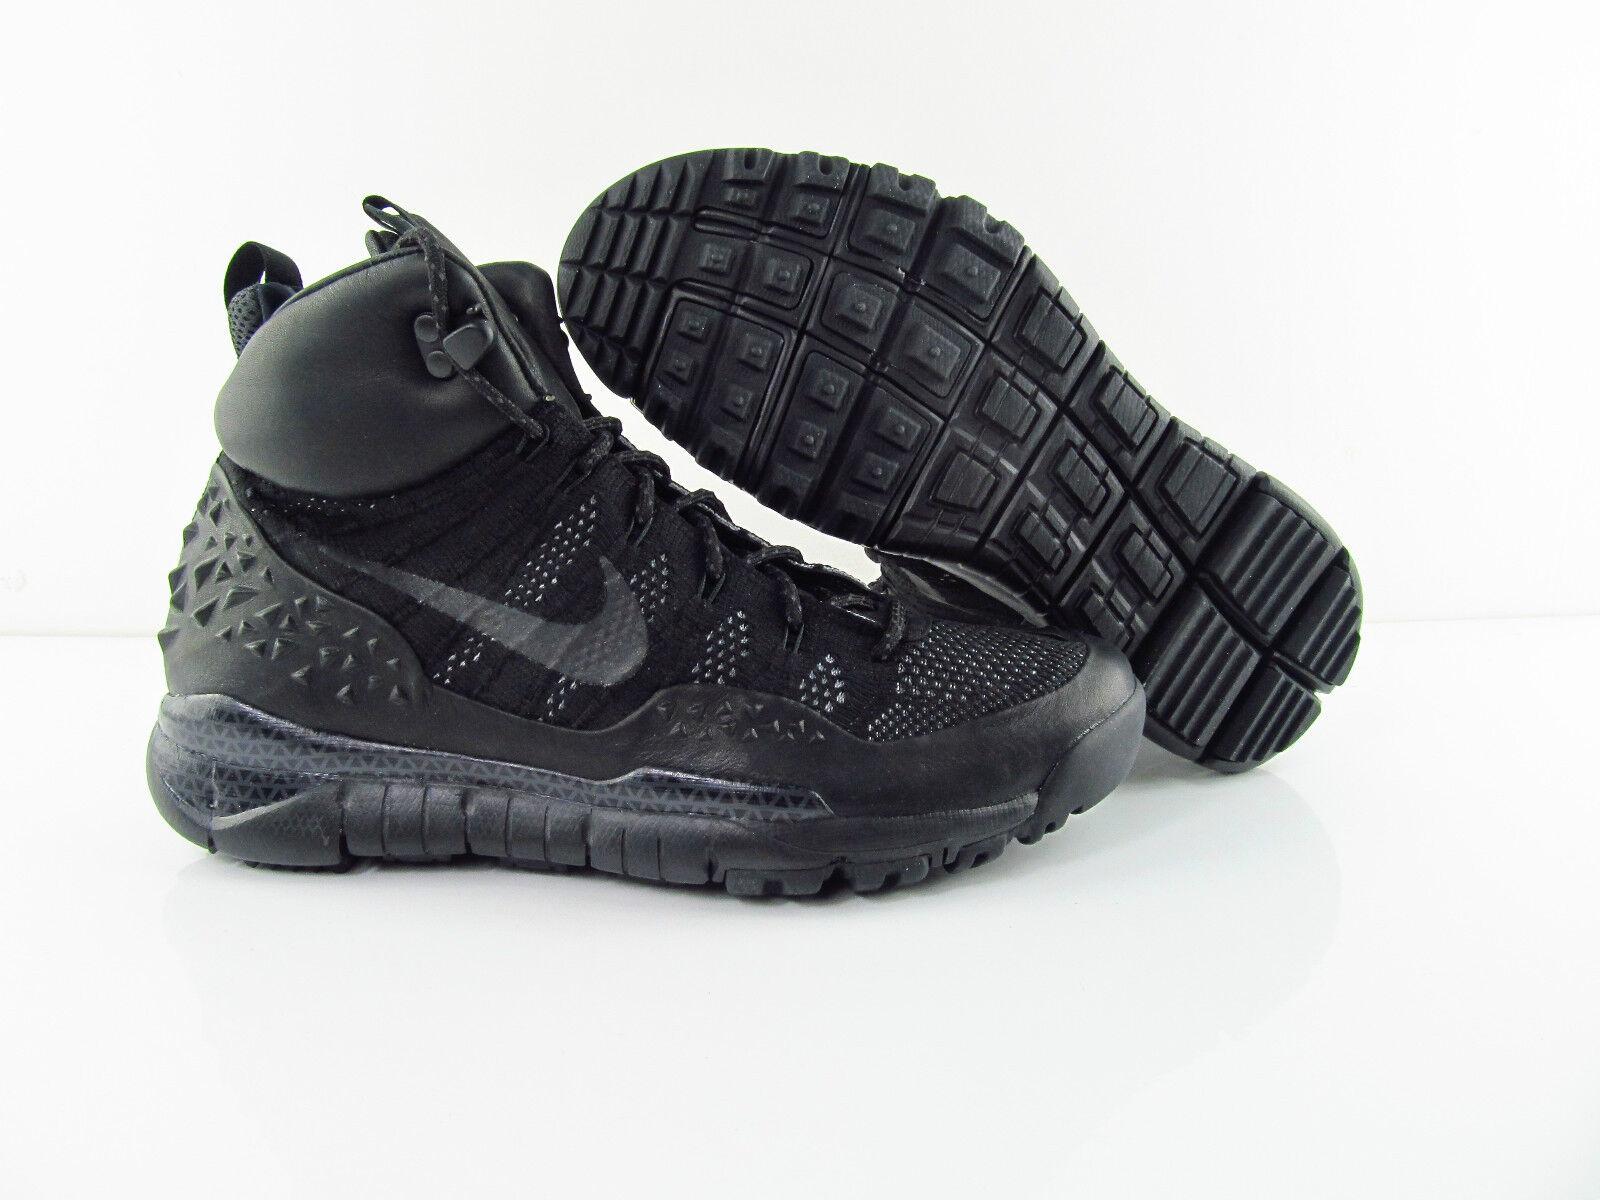 79911aaf94 Nike Lupinek Flyknit ACG Black Anthracite NIKELAB UK_12 US_13 Eur ...